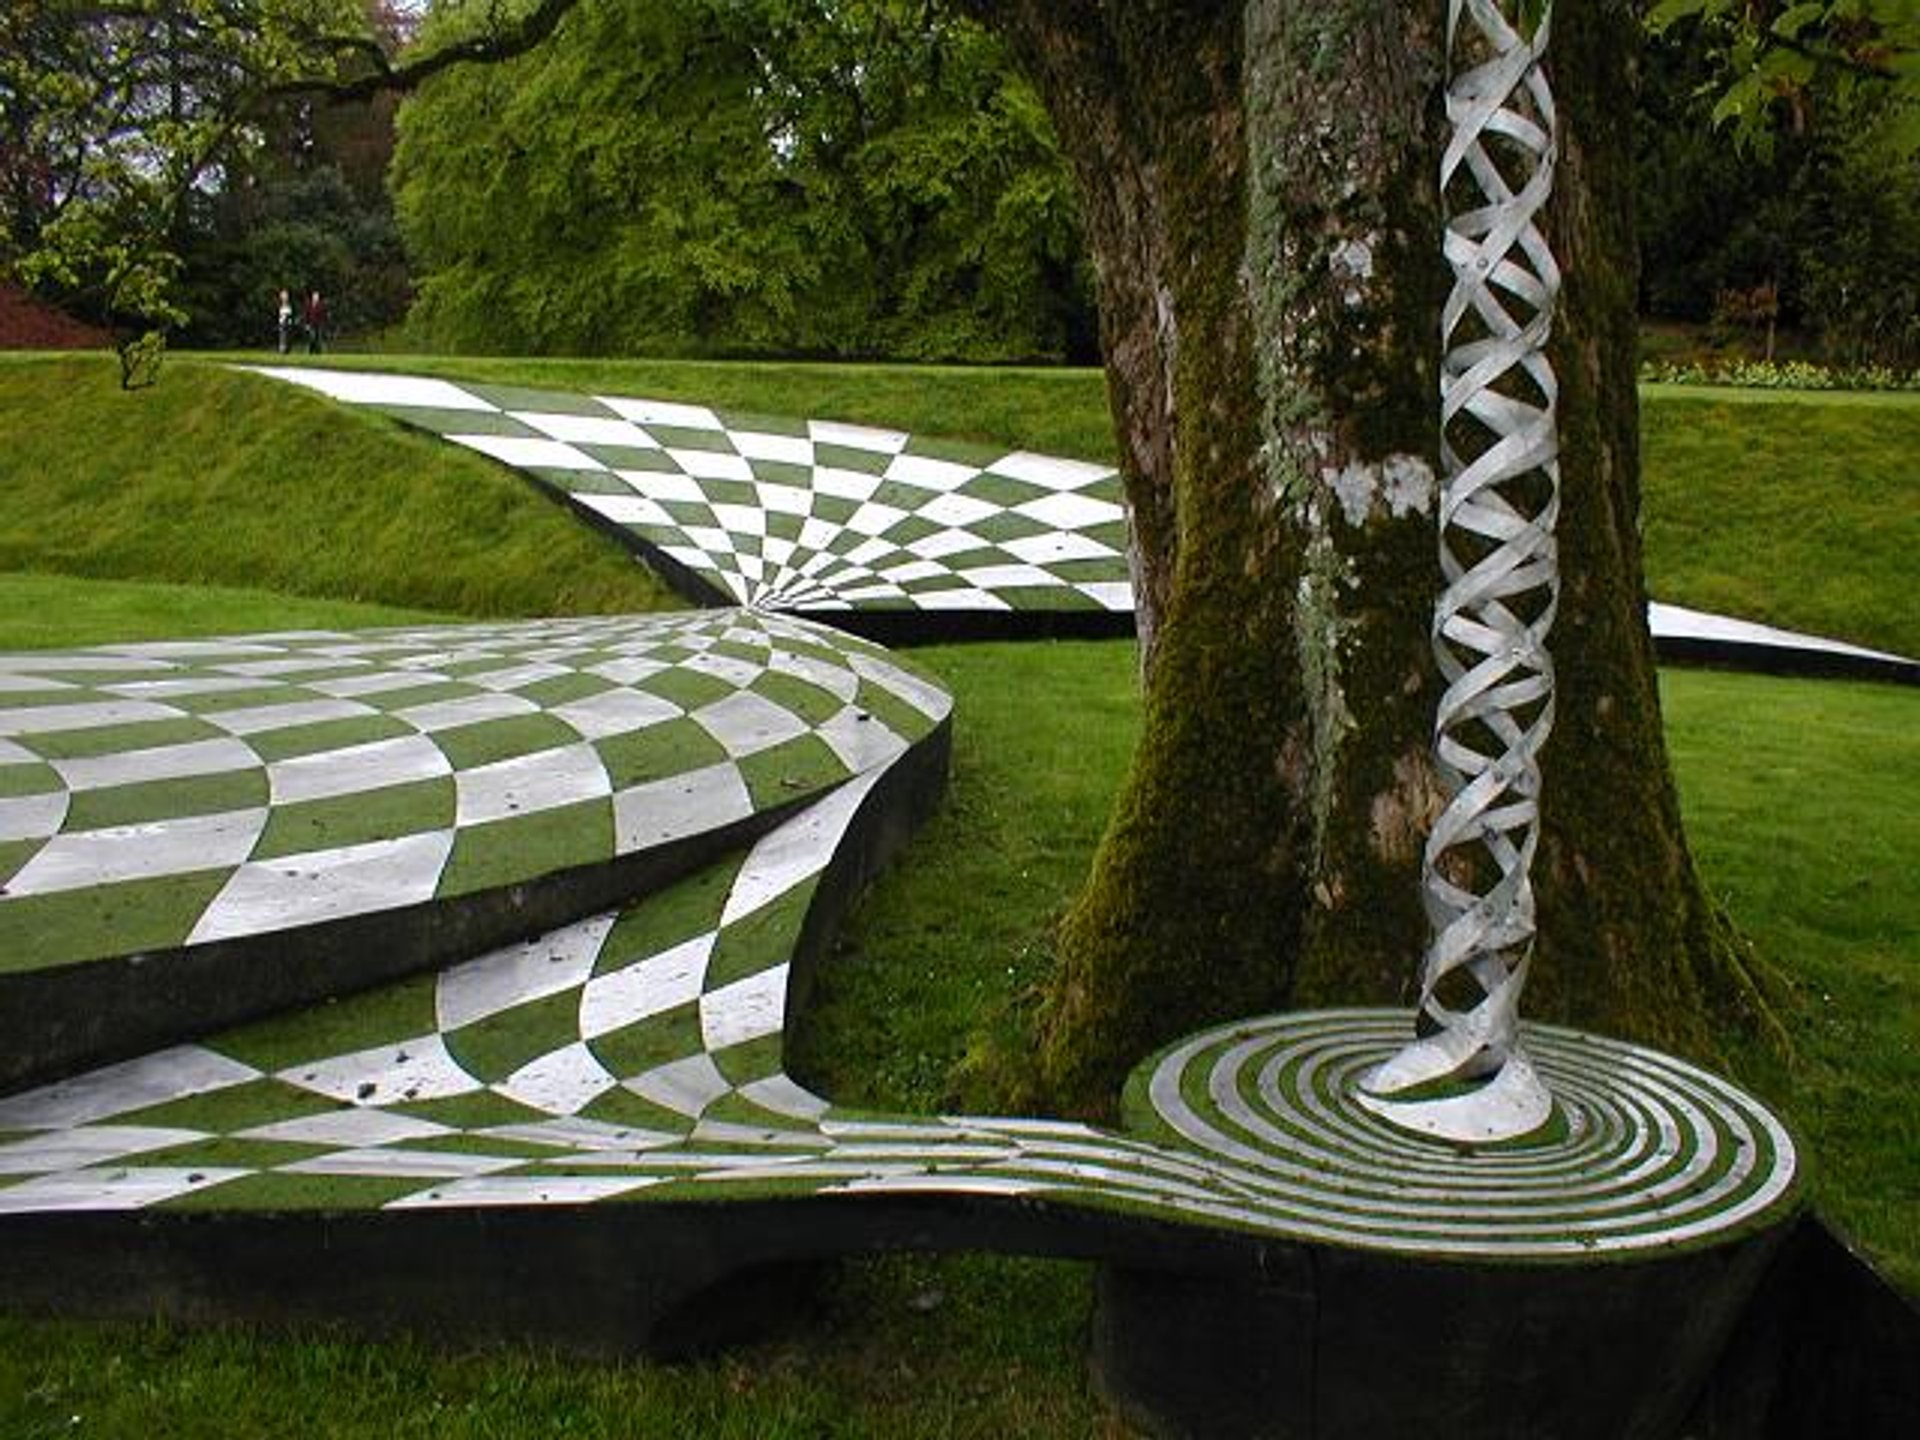 Garden of Cosmic Speculation in Scotland 2019 - Best Time